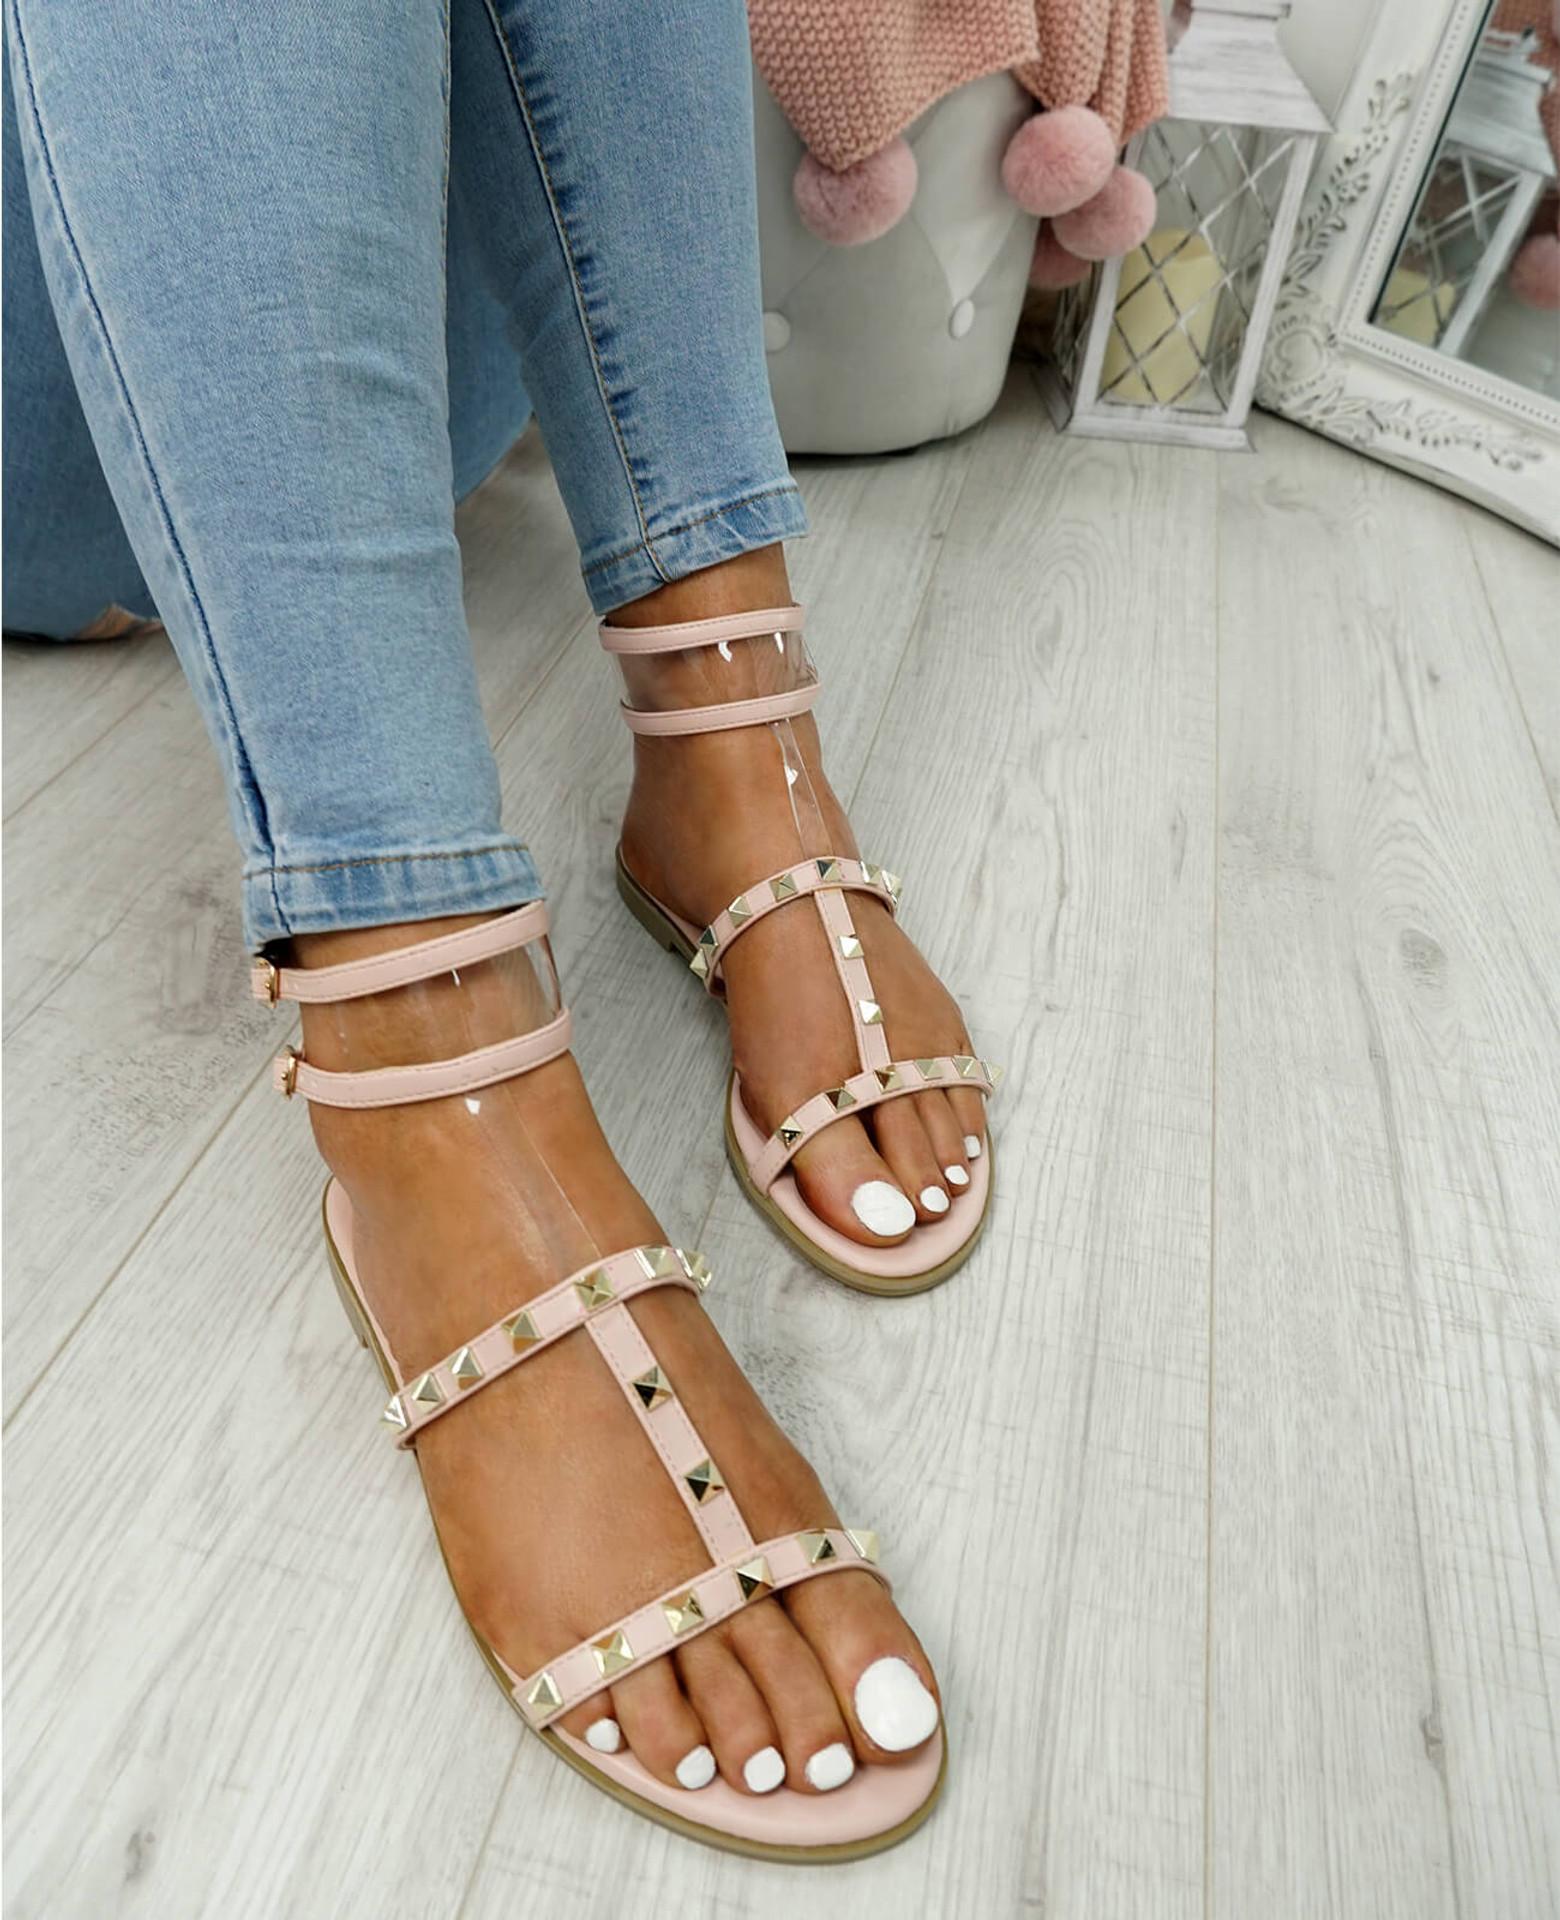 womens pink rock studs sandals t-strap size uk 3 4 5 6 7 8